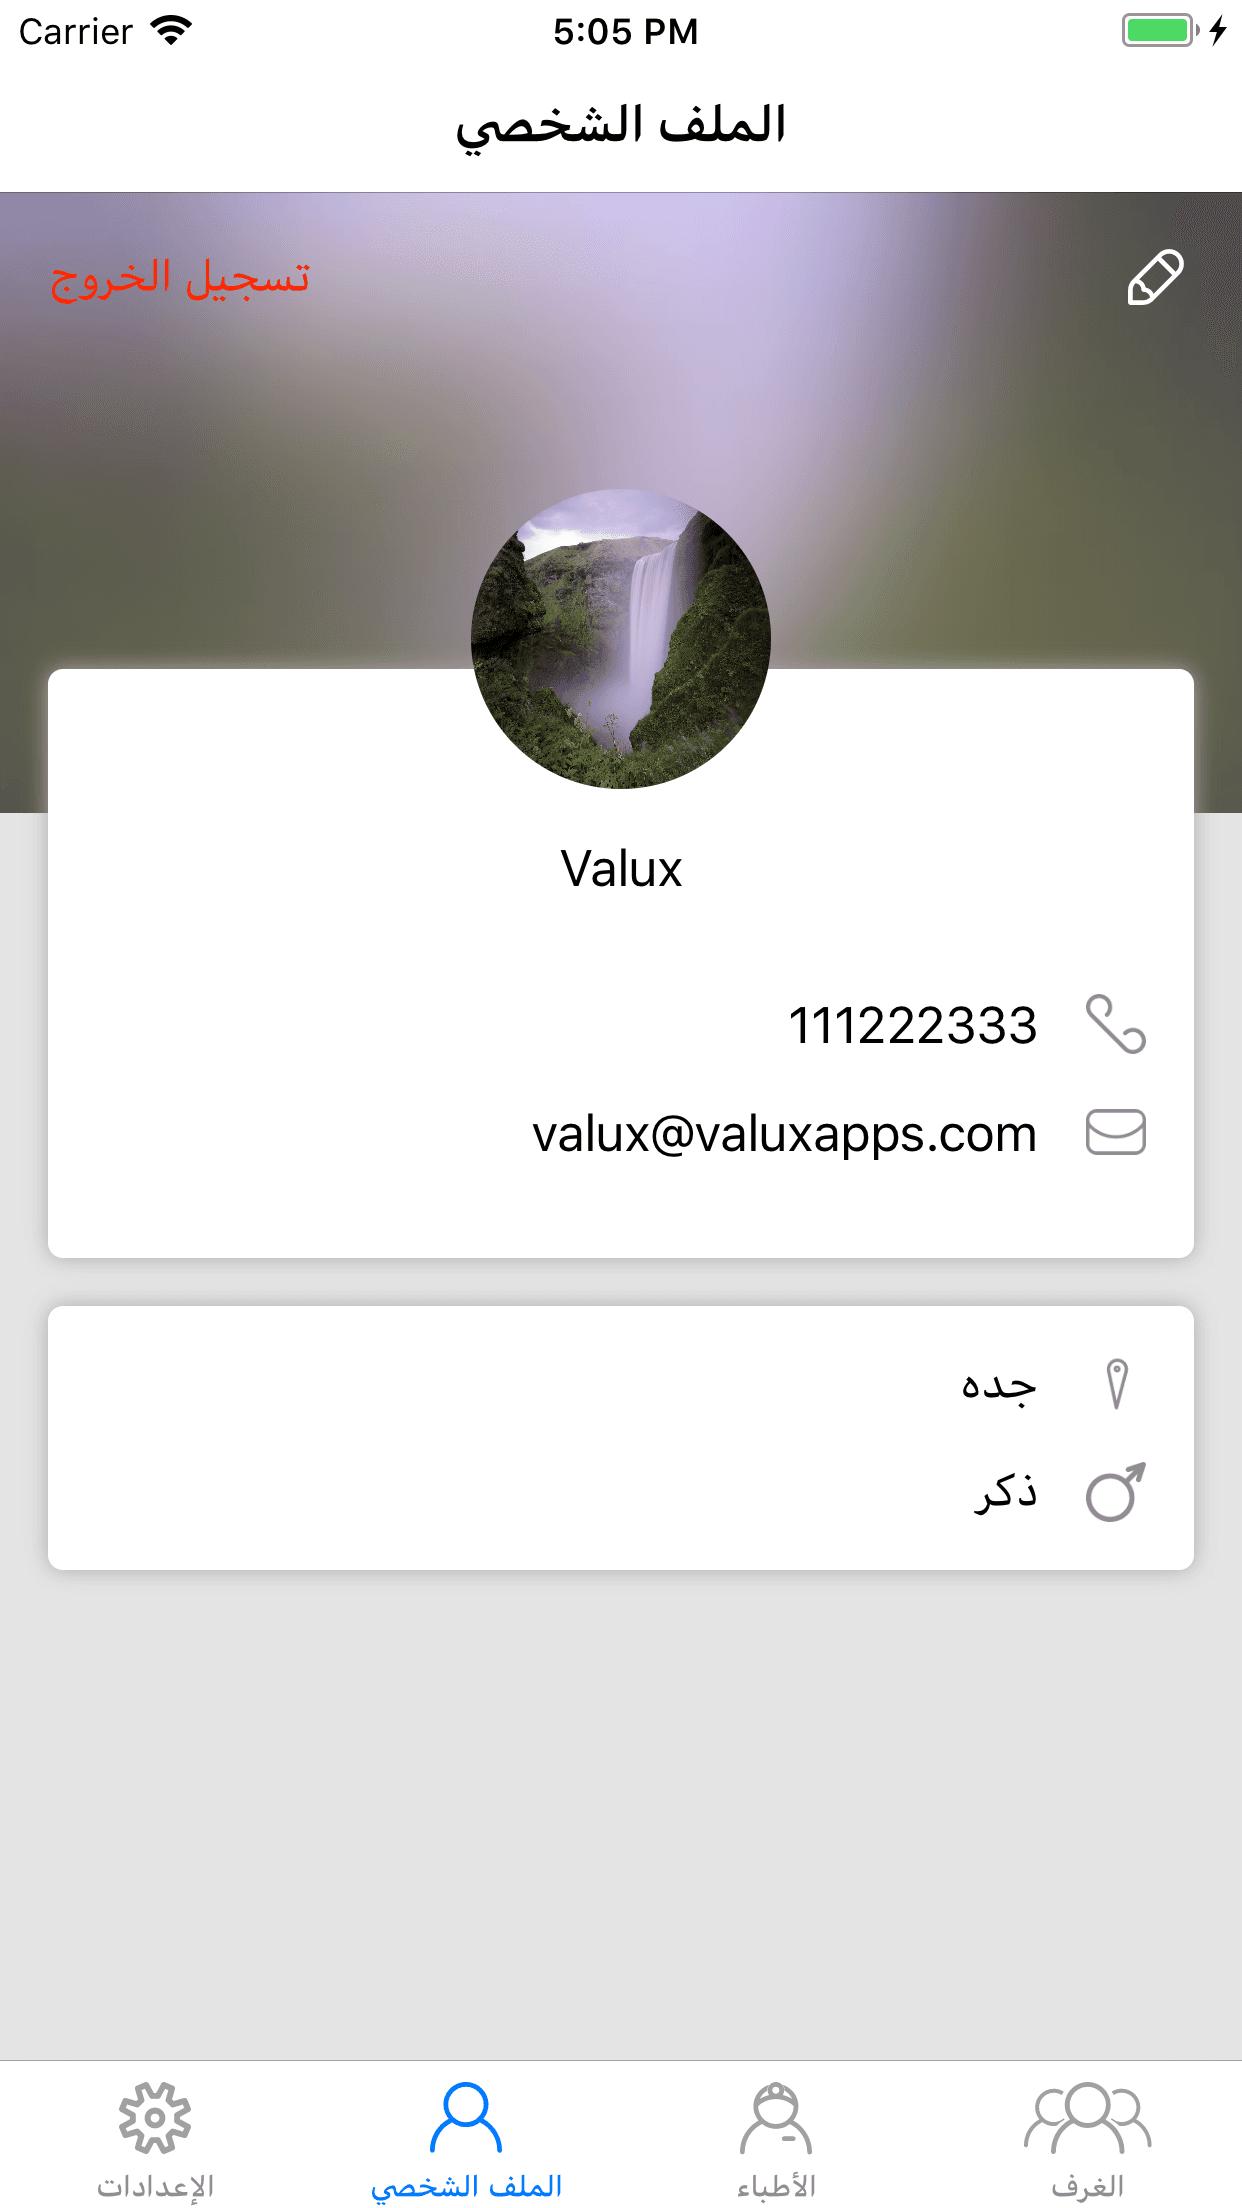 Valux - رشاقتي